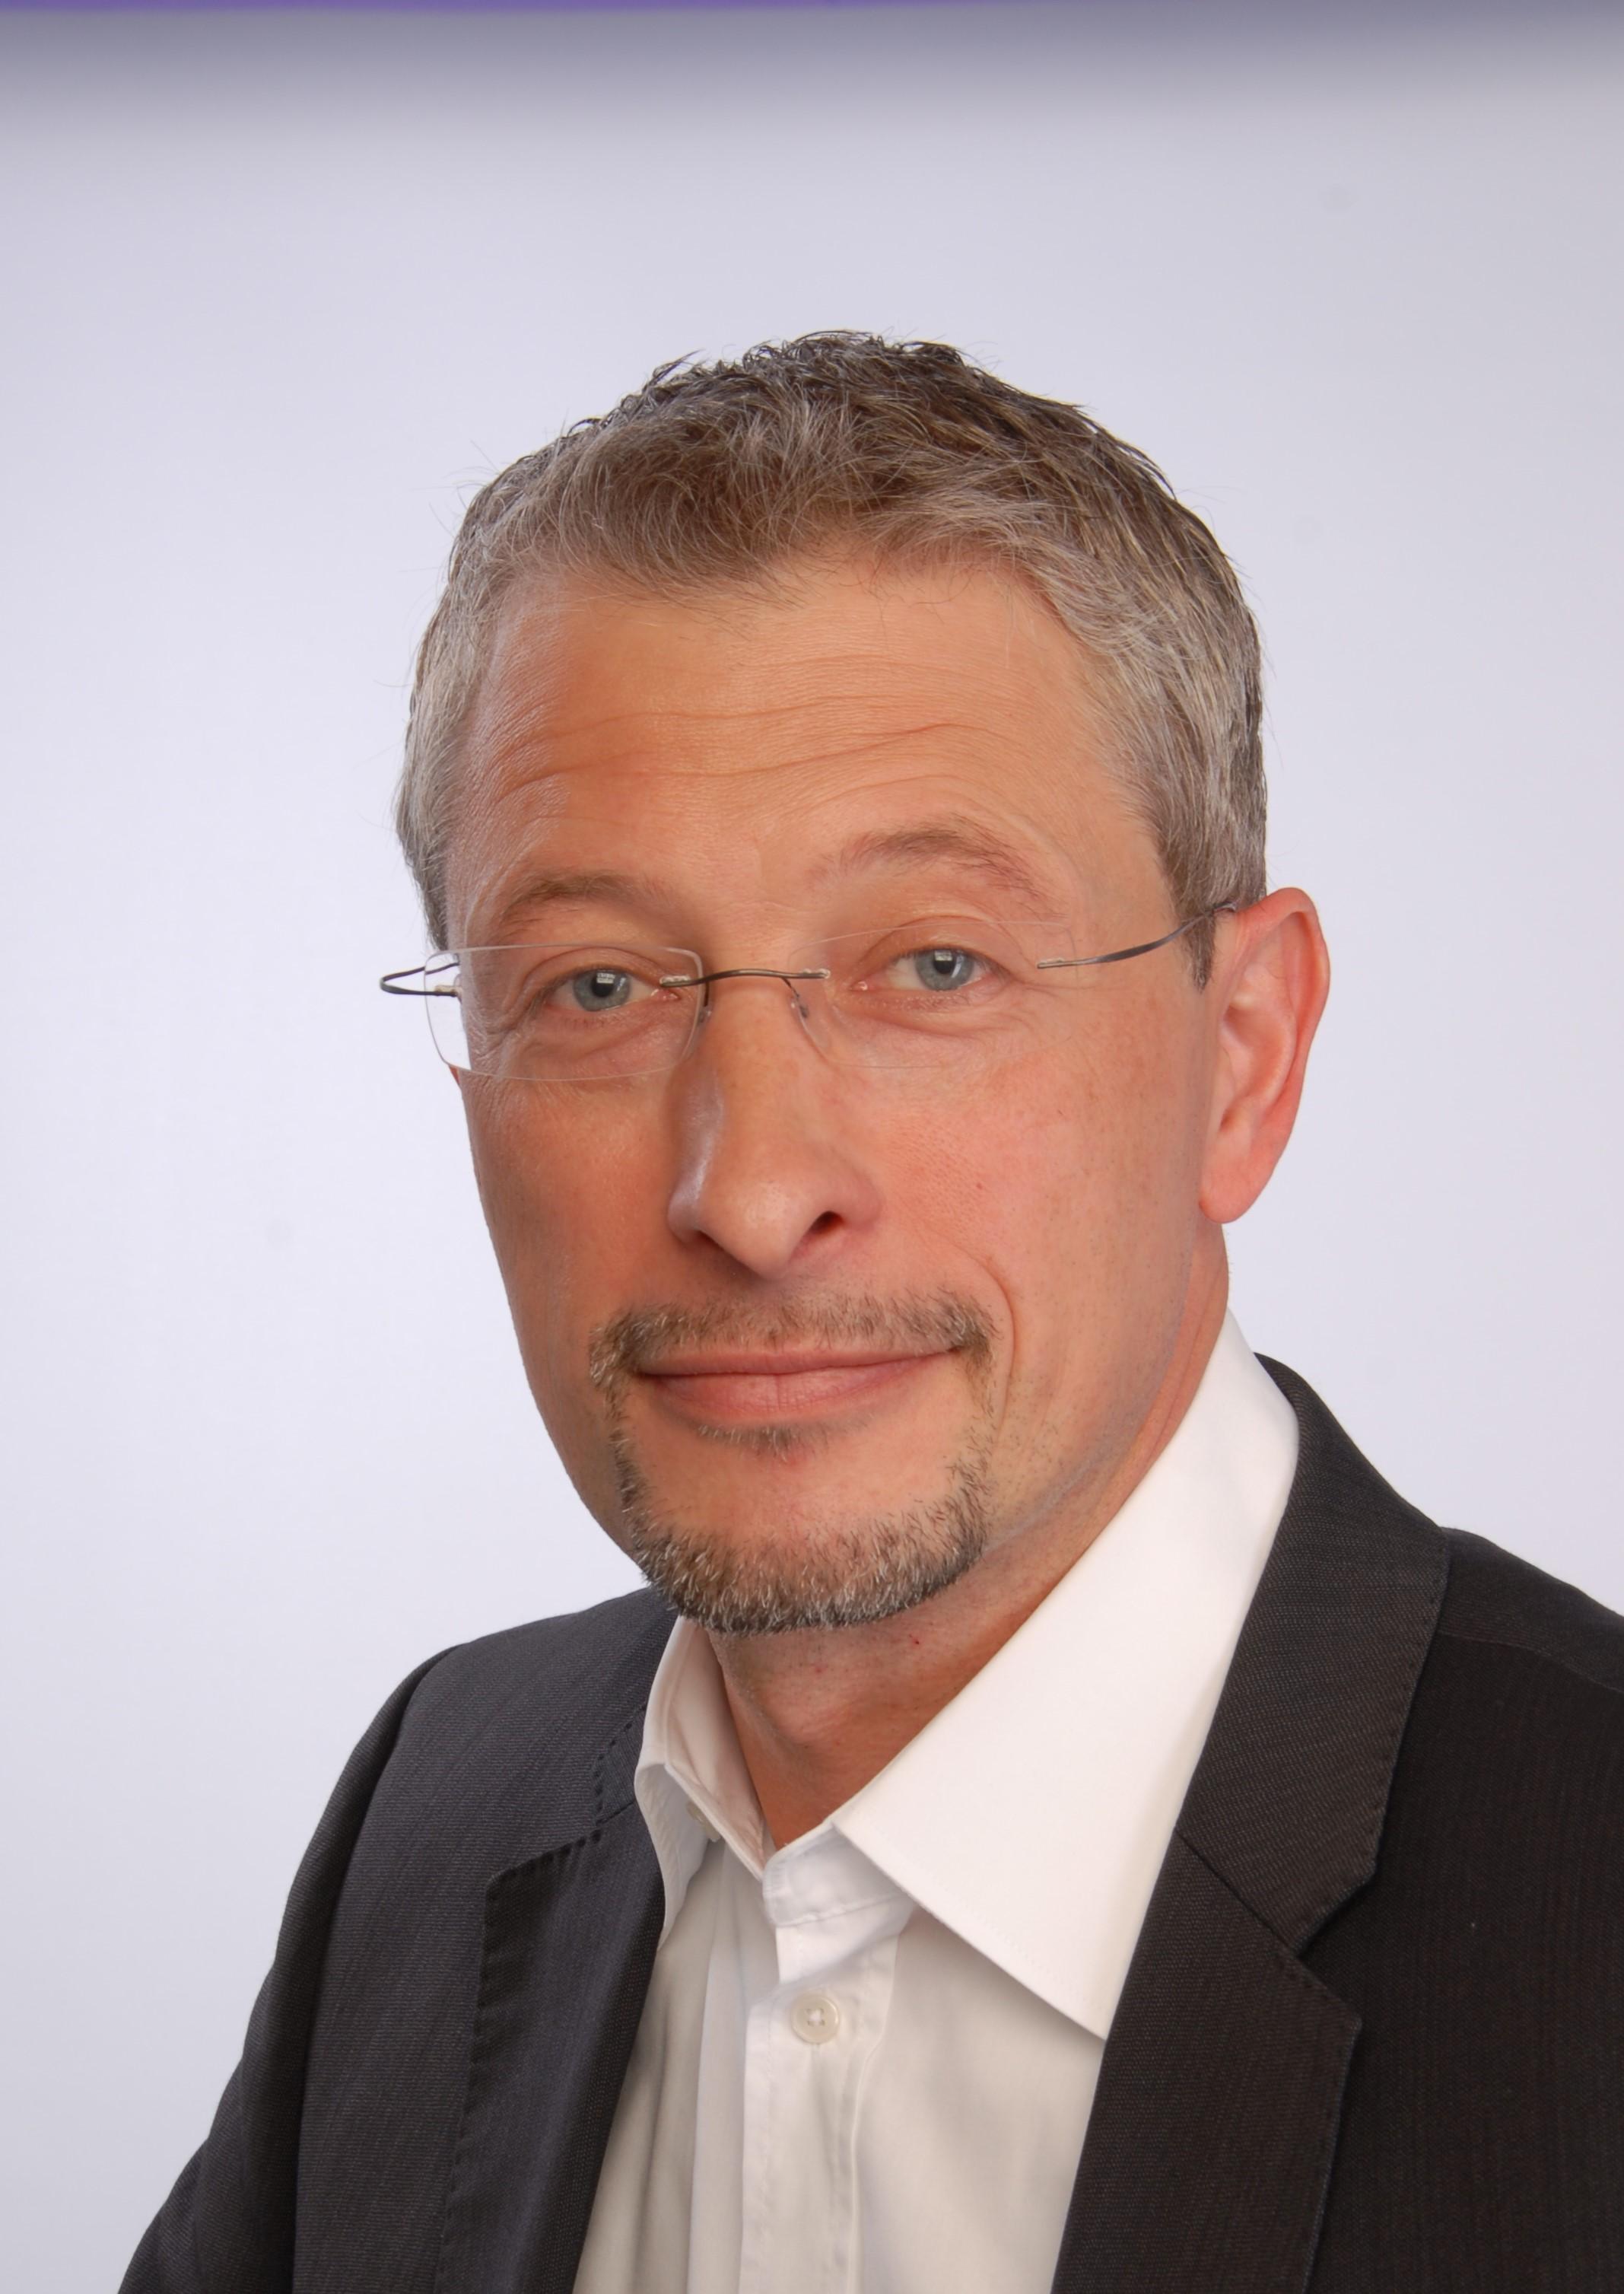 Dr. Detlef Gurgel